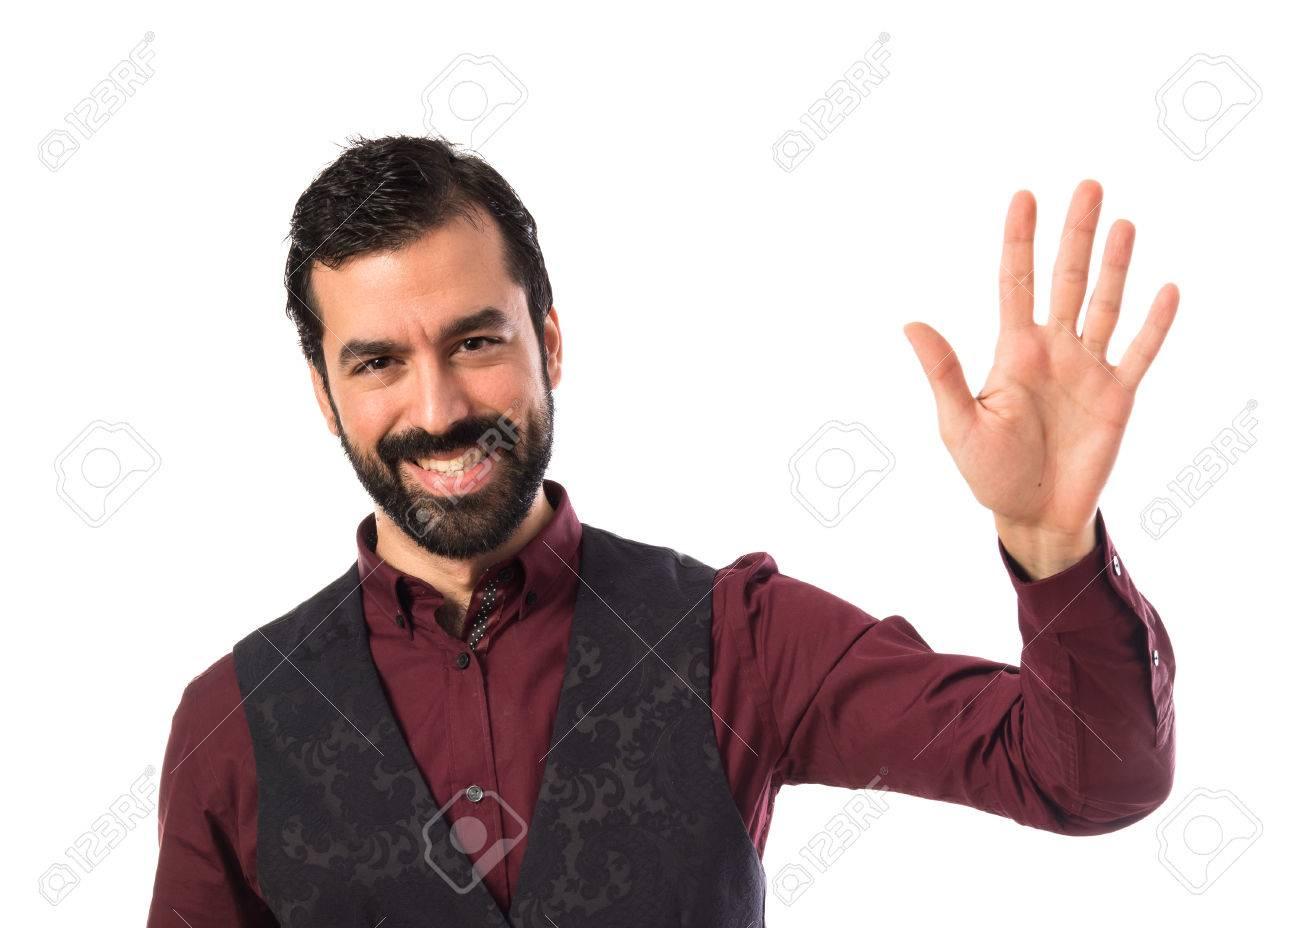 Man wearing waistcoat saluting - 39156966